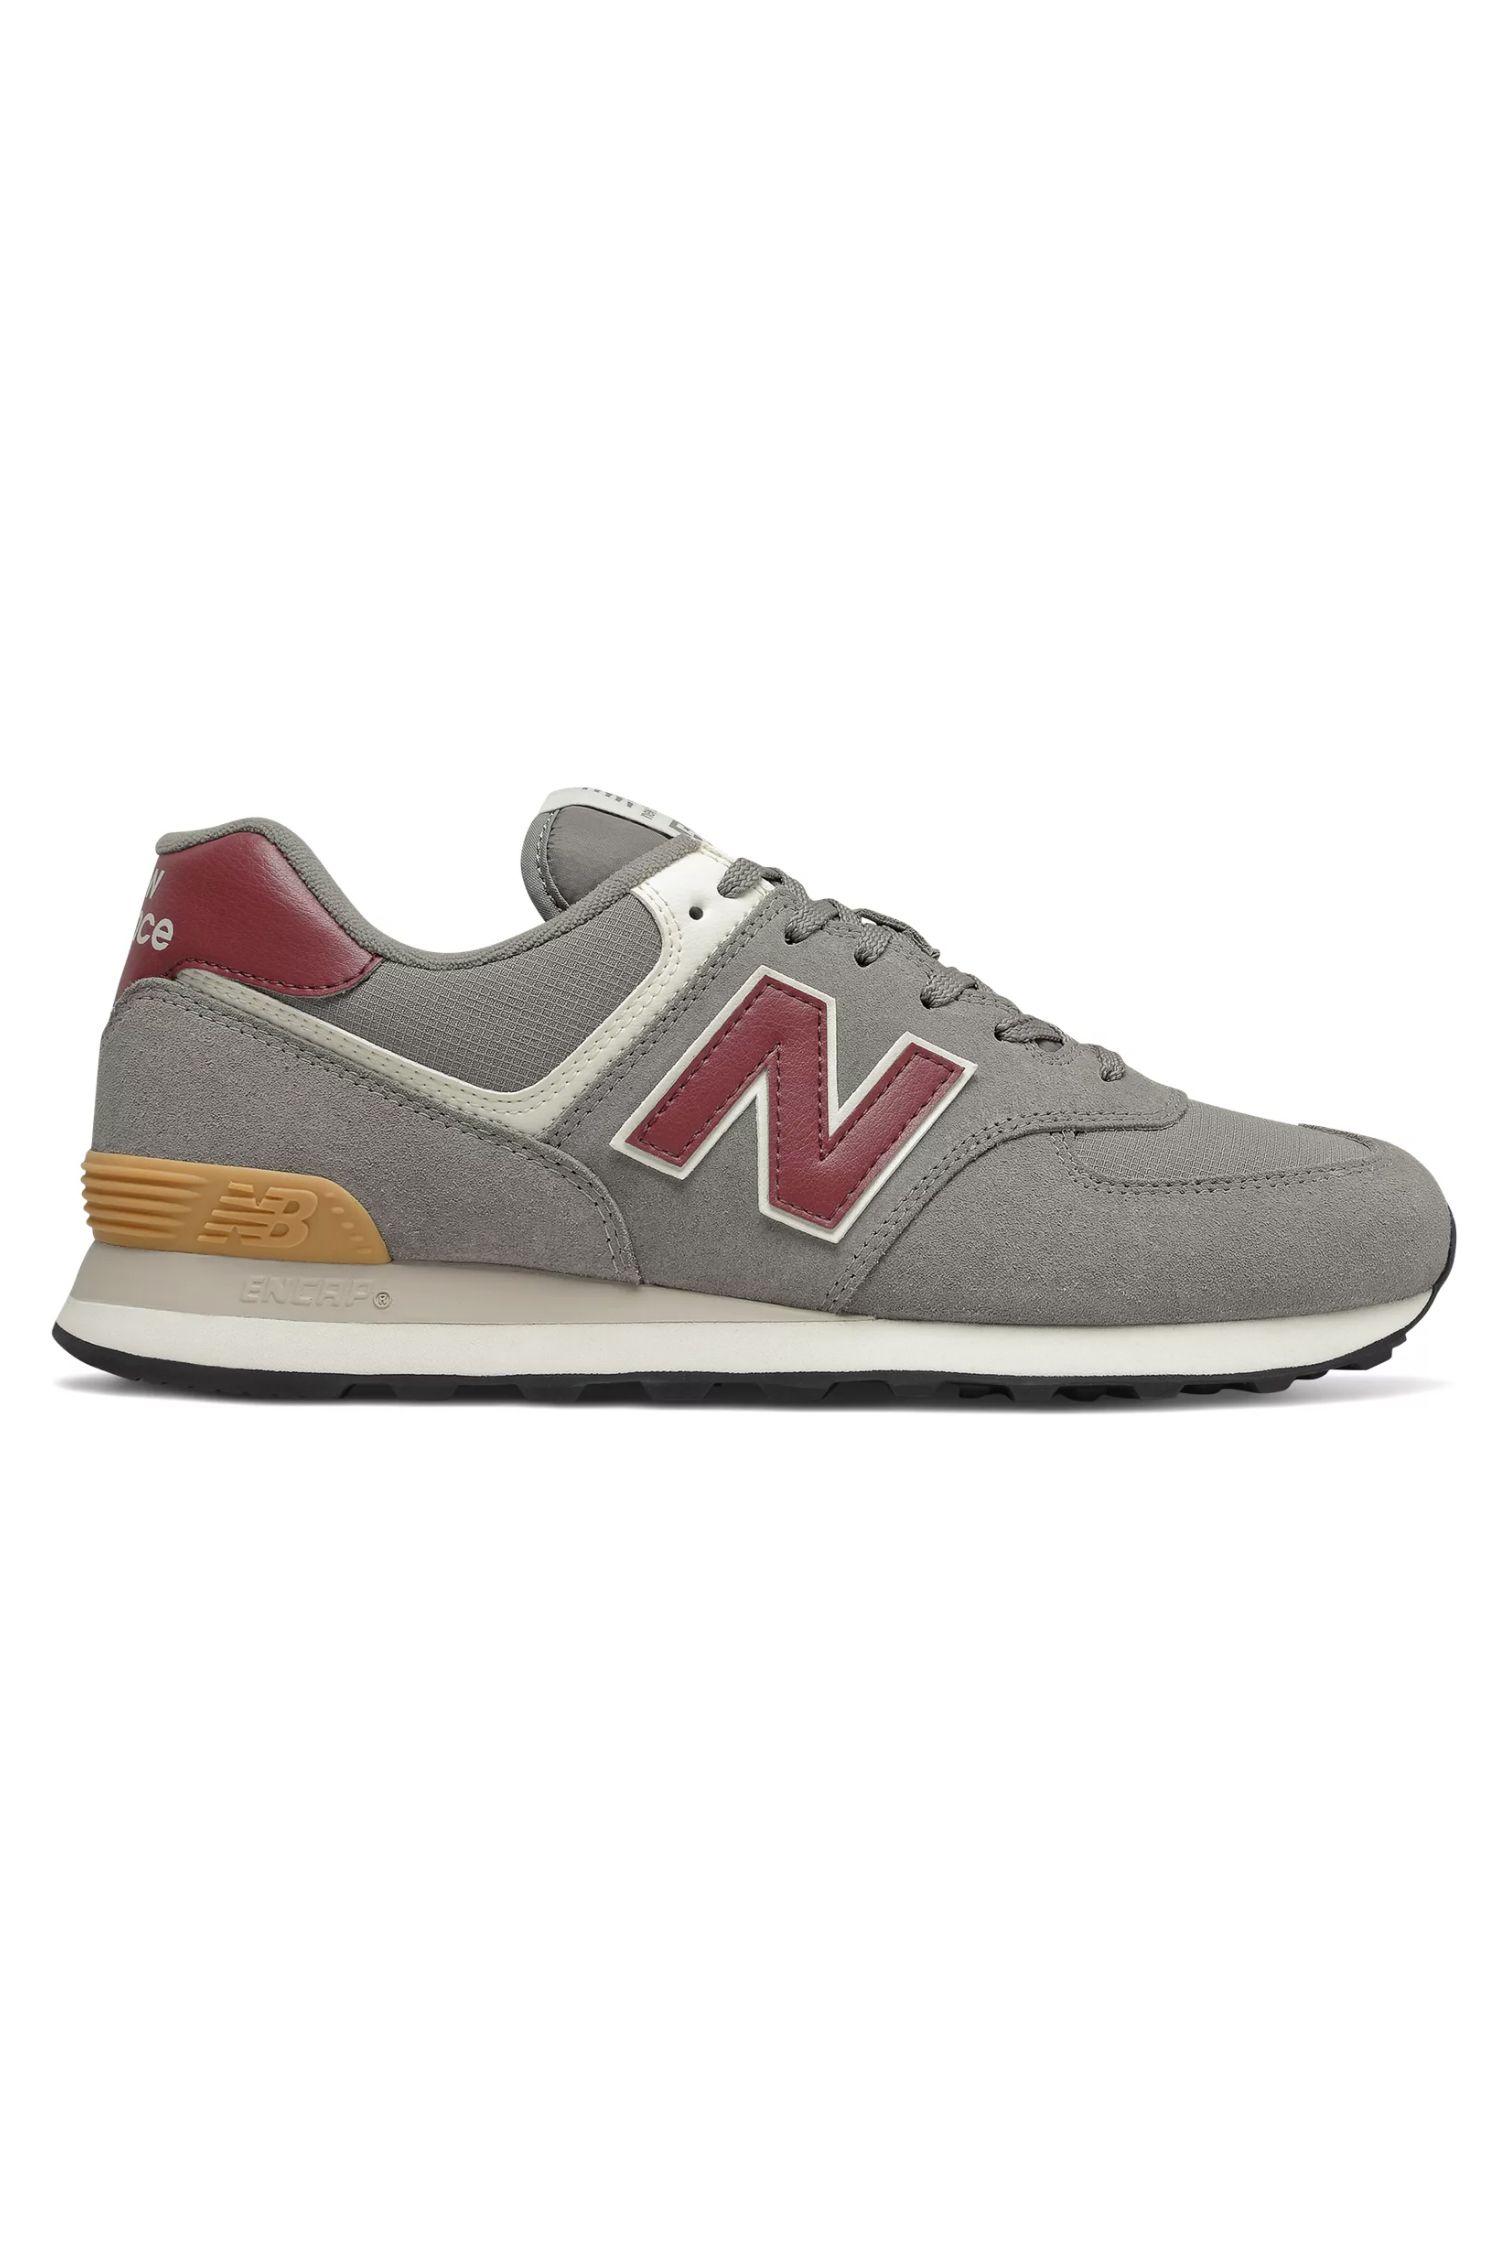 New Balance Shoes ML574 Grey